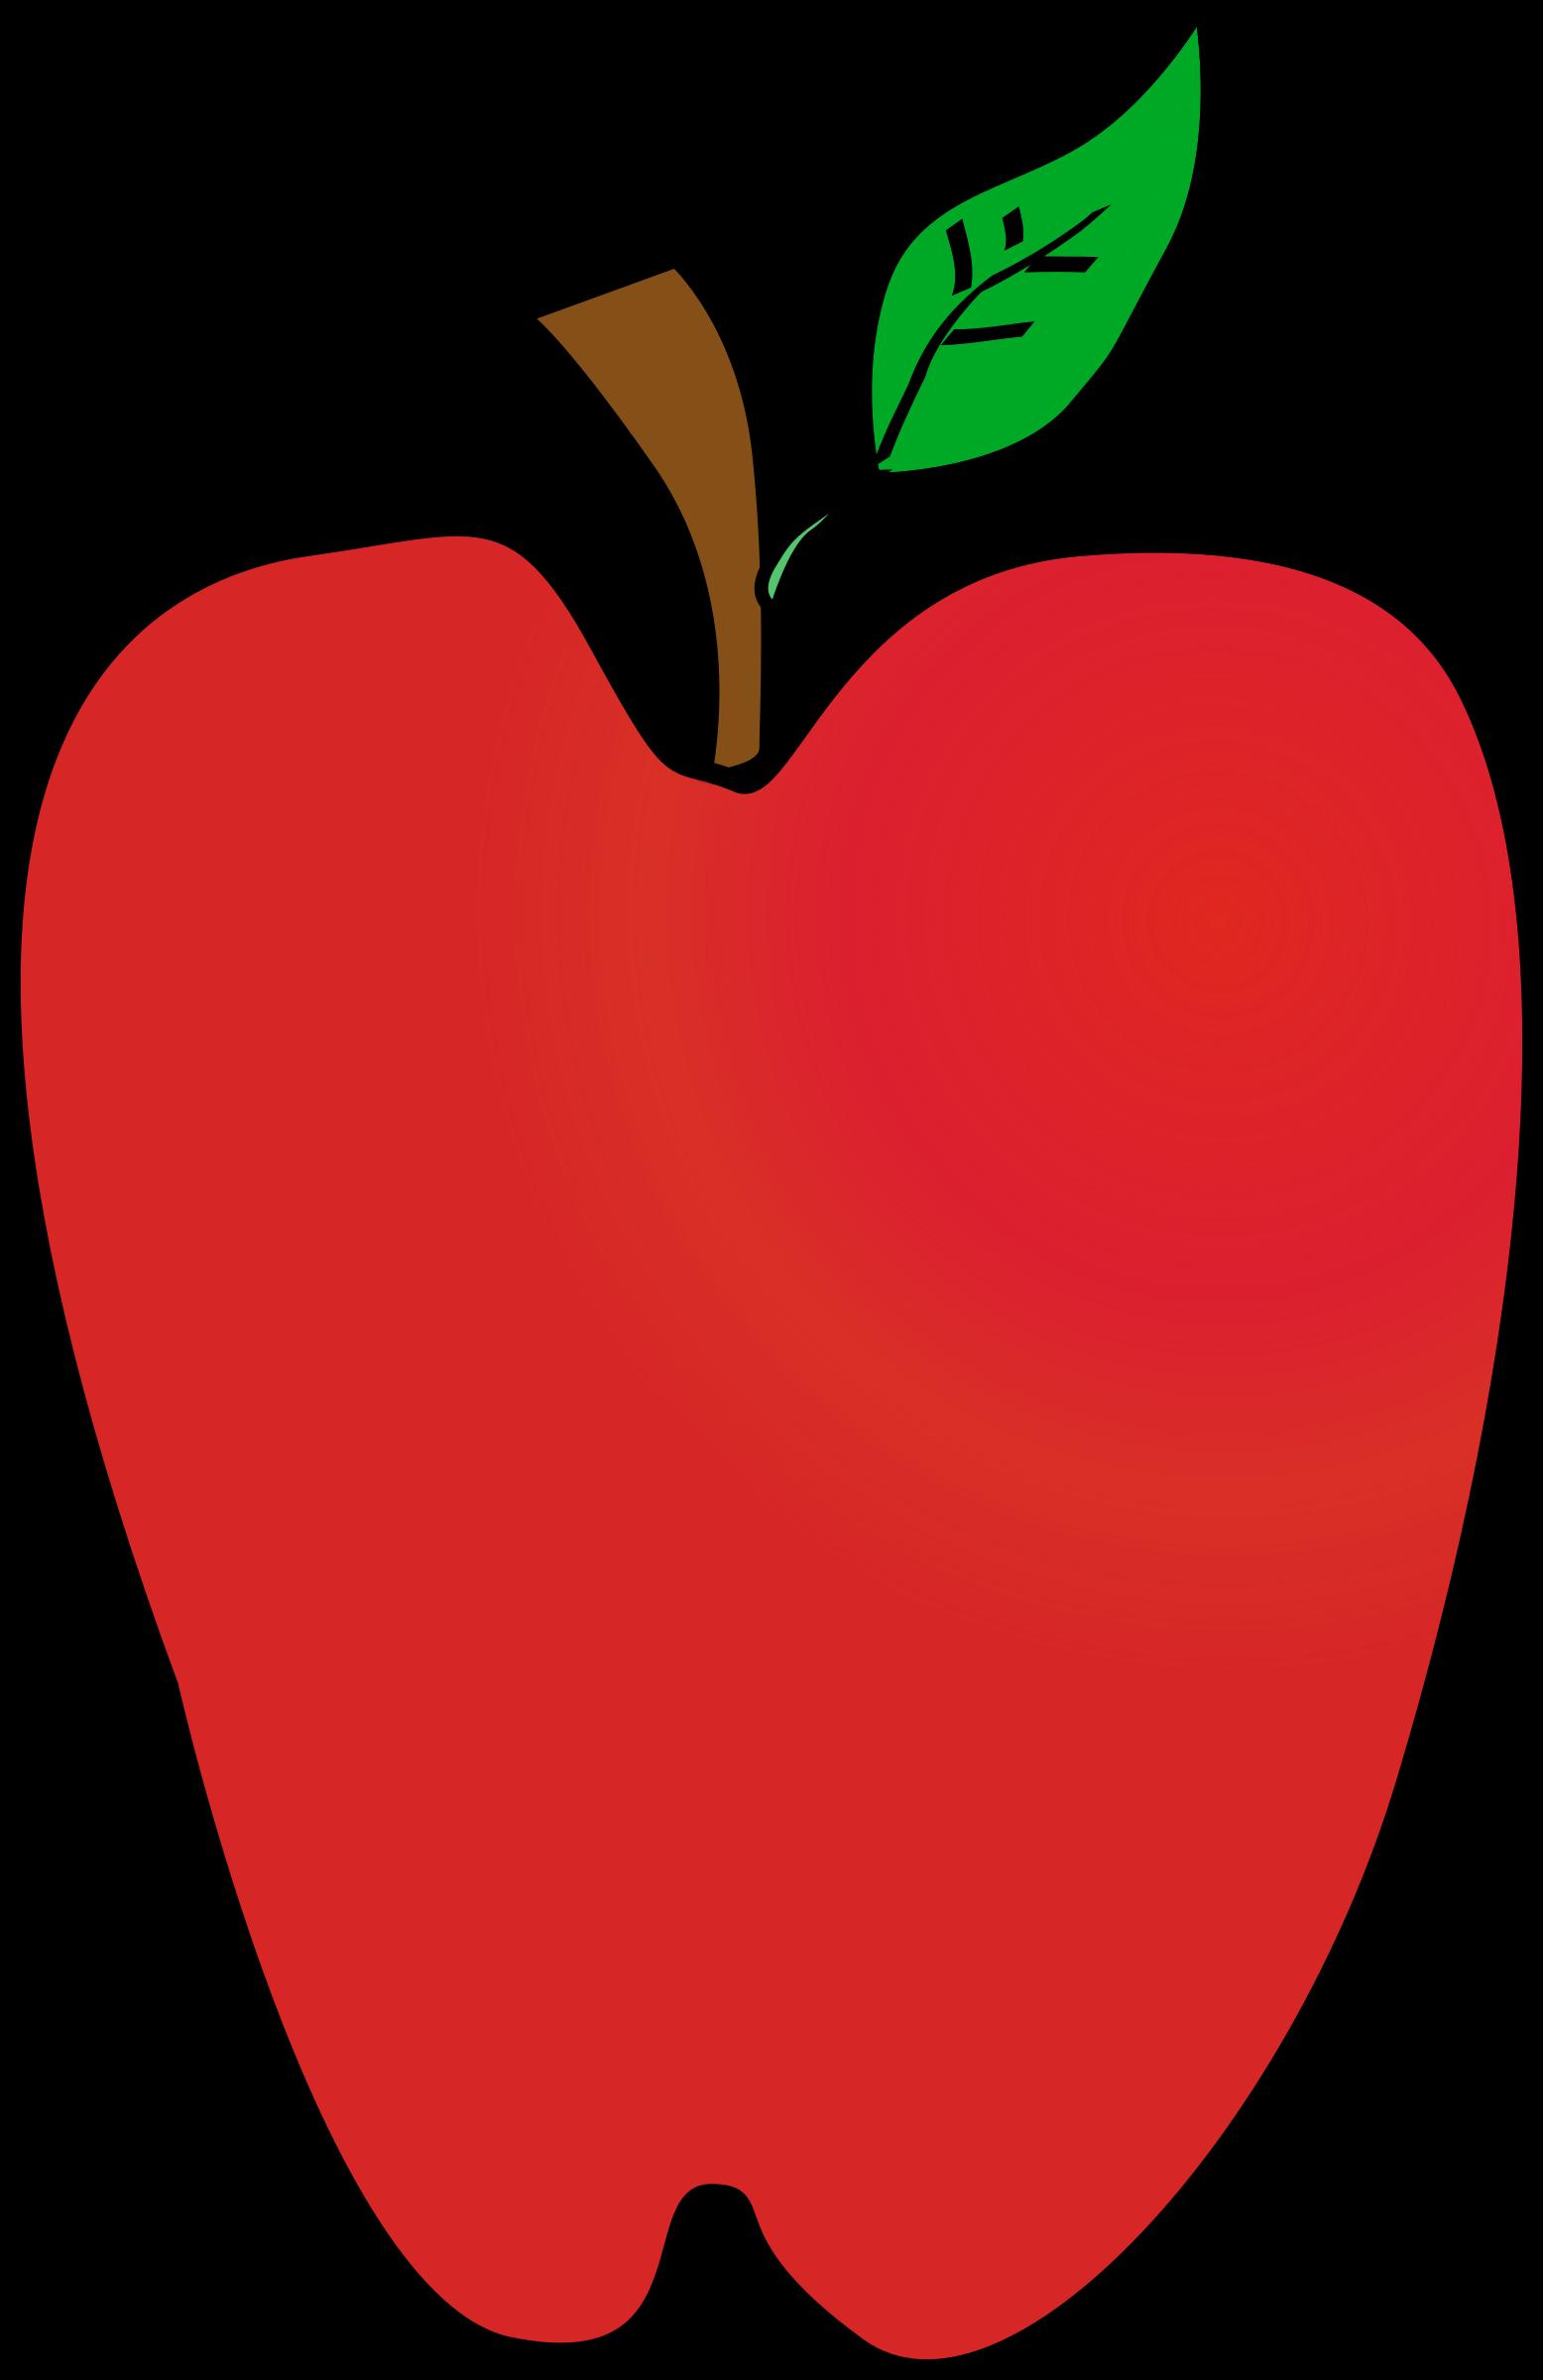 Clipart apple animated. Cartoon k yager r